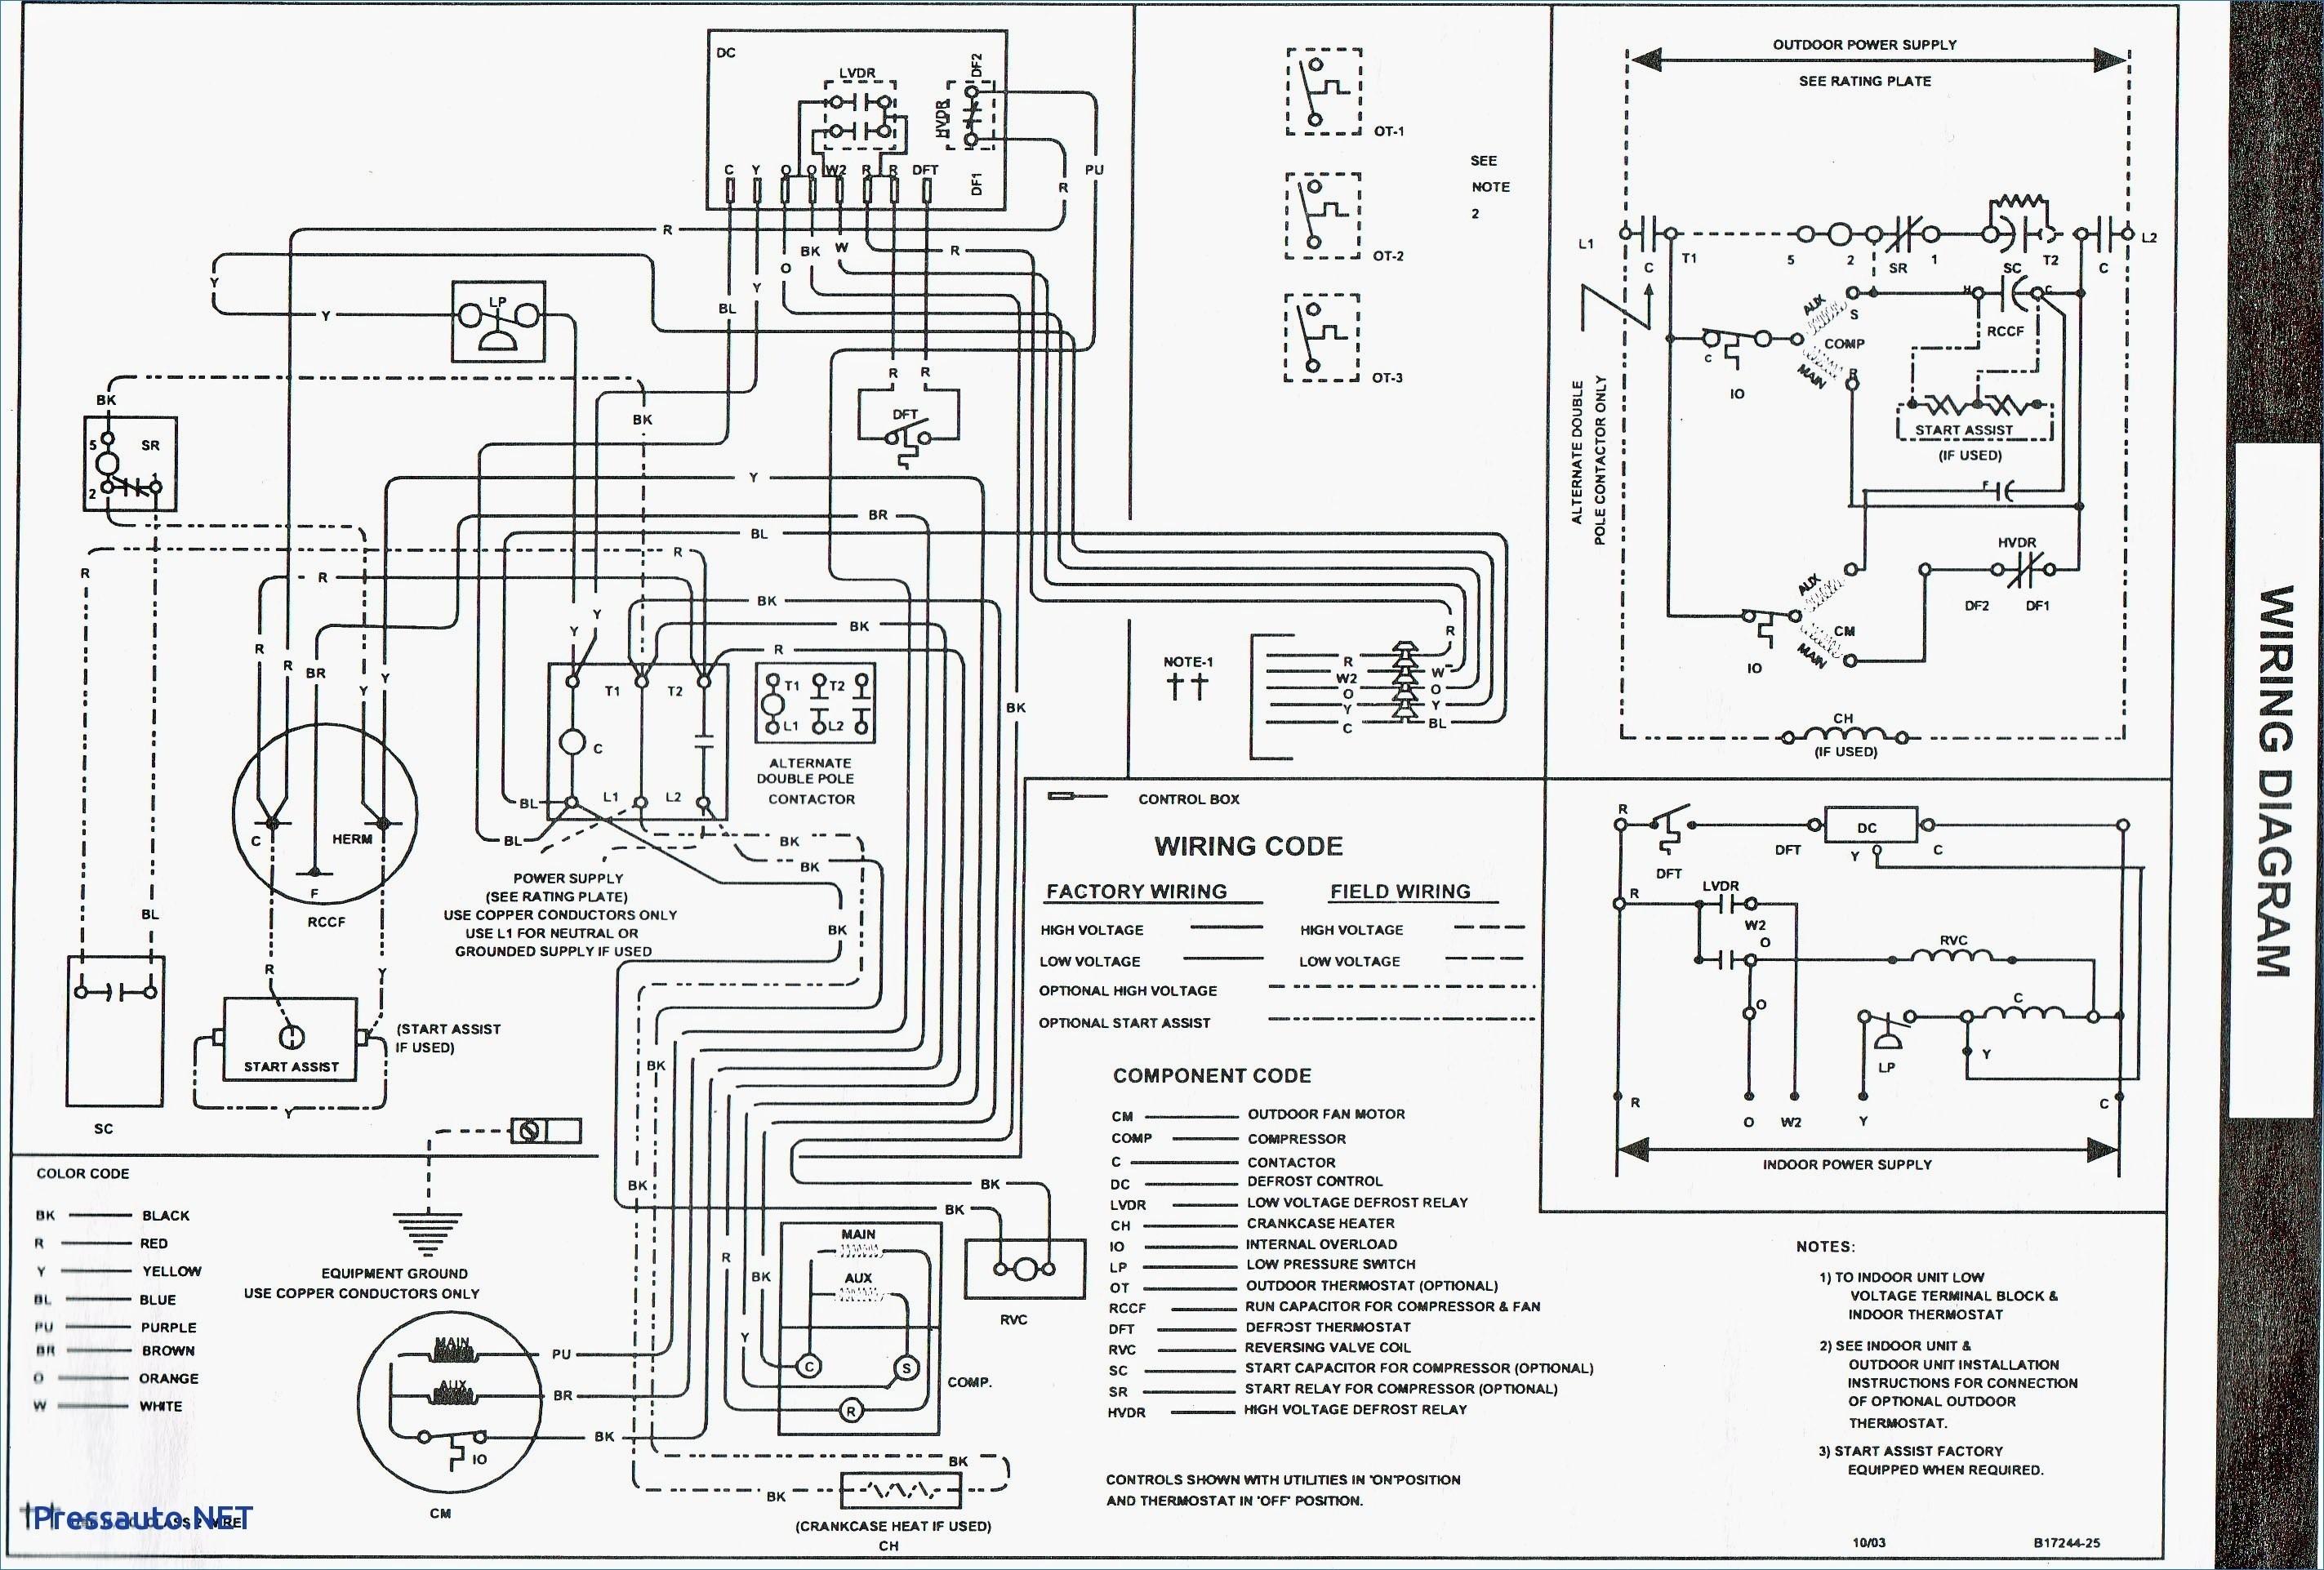 goodman gas furnace diagram